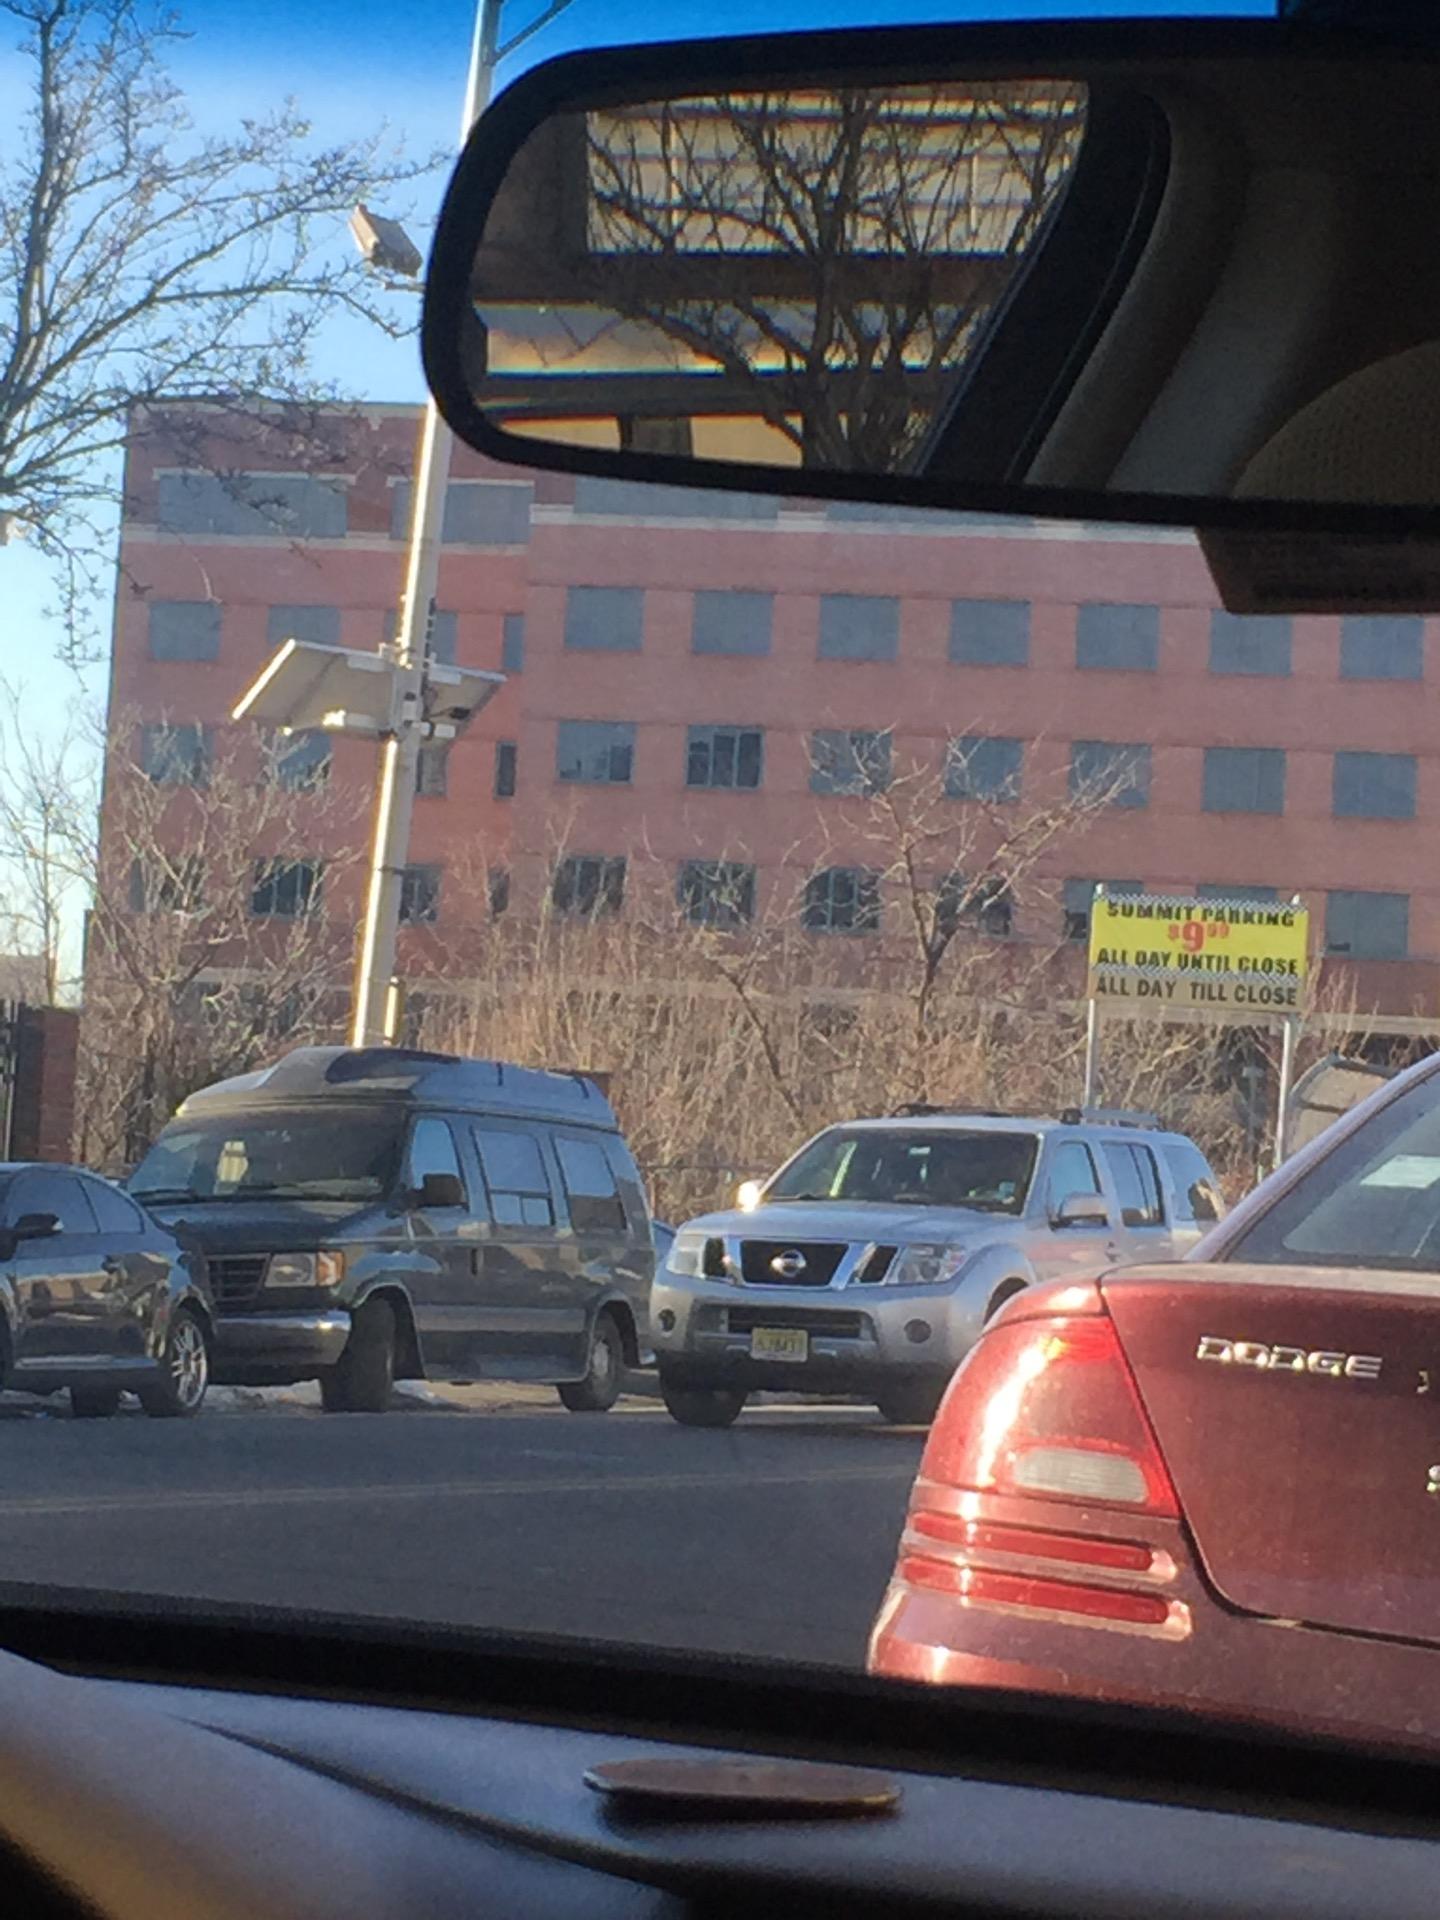 New Jersey Motor Vehicle Commission - Jersey City Agency | 438 Summit Ave, Jersey City, NJ, 07307 | +1 (609) 292-6500